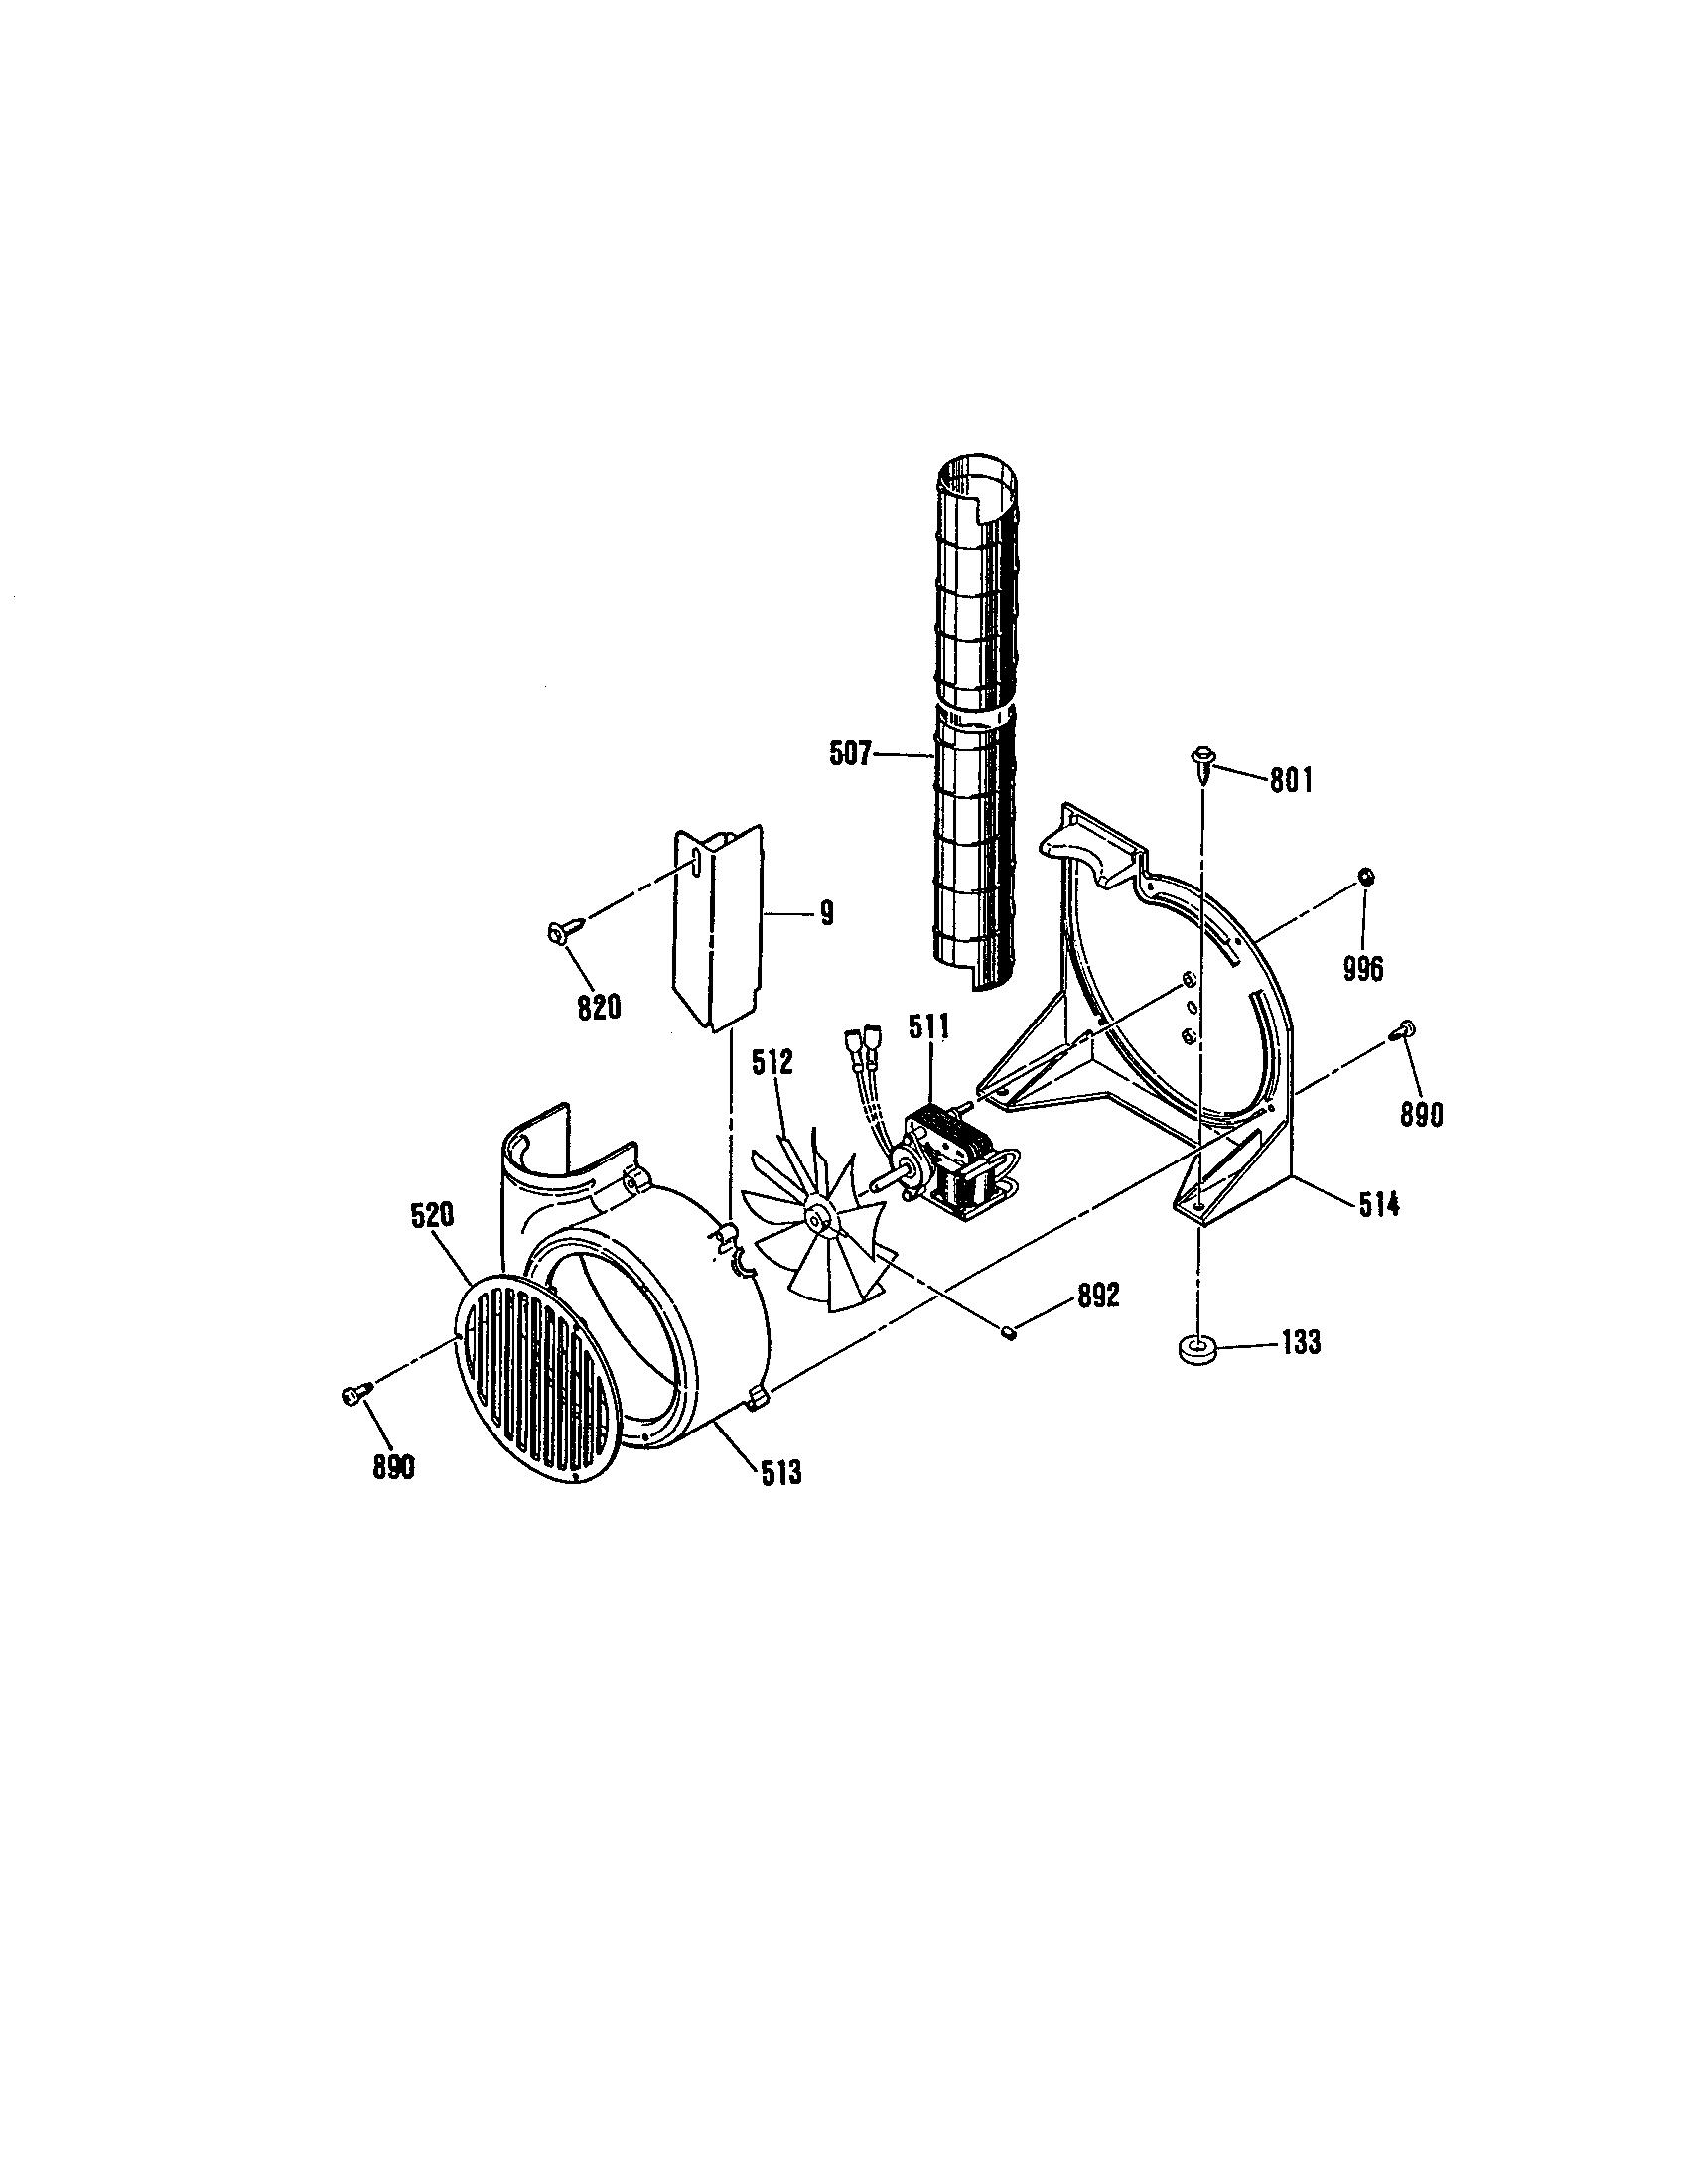 general electric jsp28gp range timer stove clocks and appliance jsp28gp range fan blower housing parts diagram